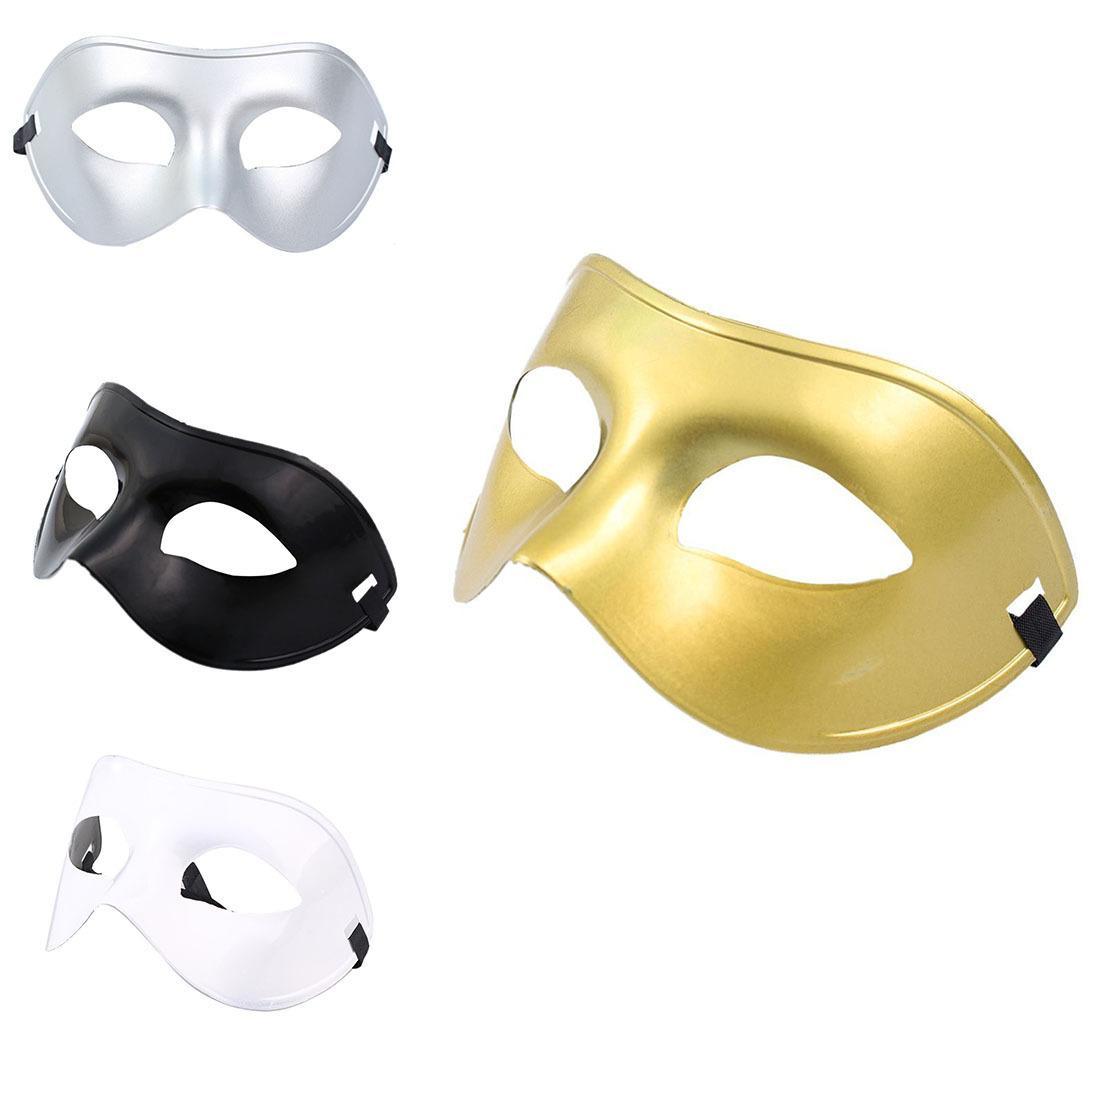 Fancy Dress Costume Sexy Men Women Costume Prom Mask Venetian Mardi Gras Party Dance Masquerade Ball Halloween Carnaval Mask